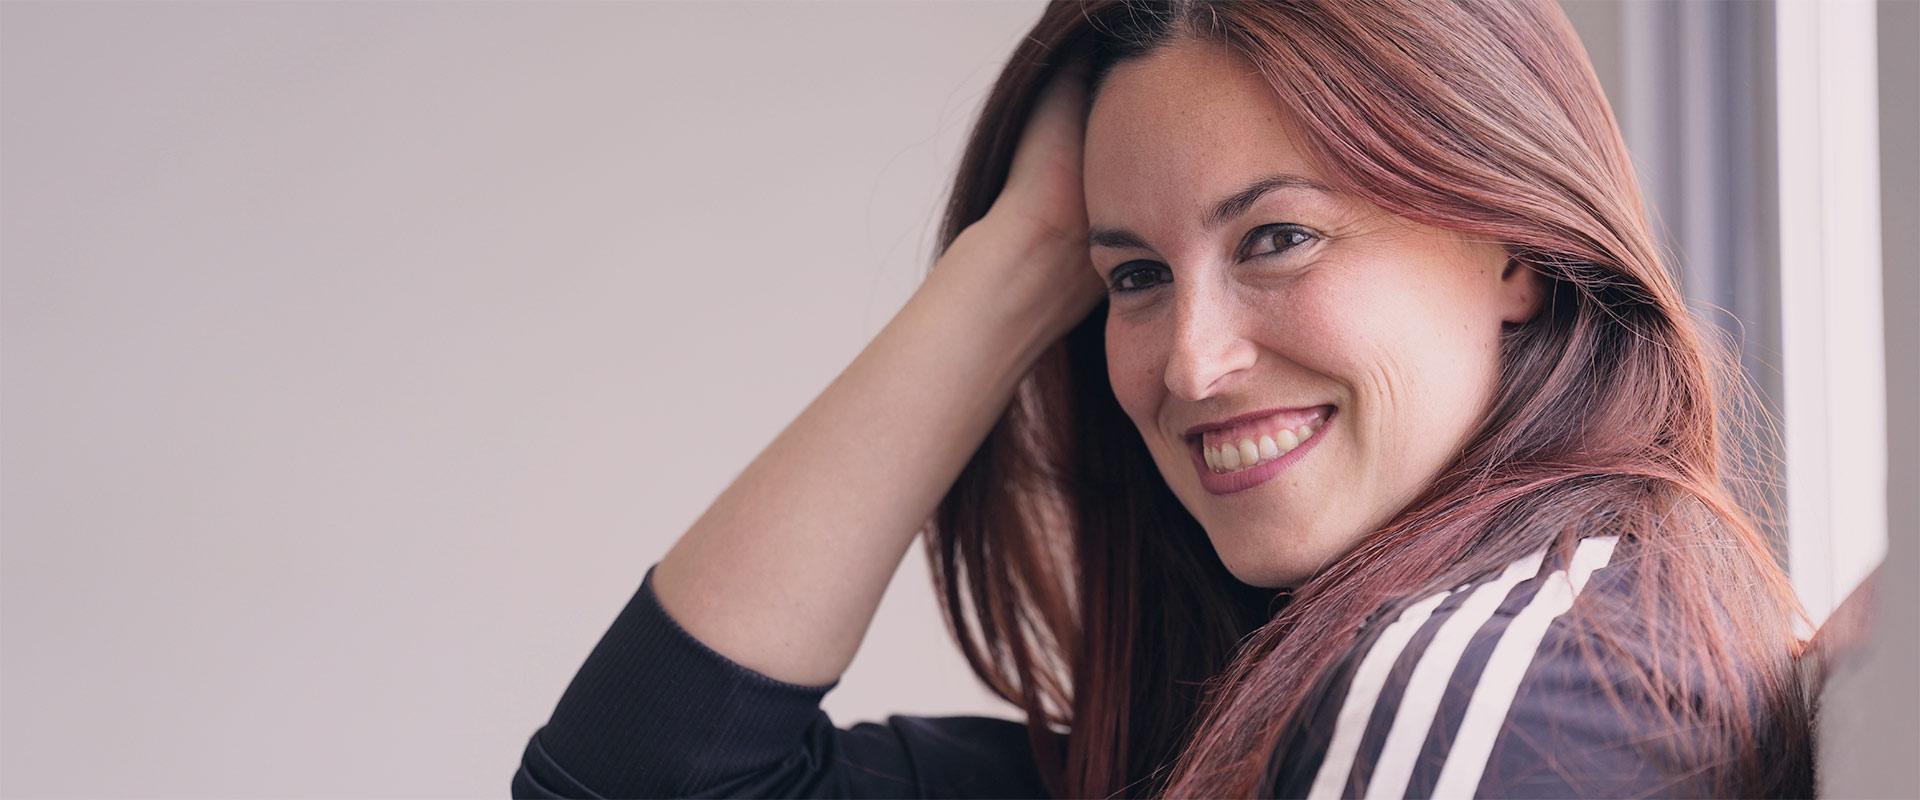 Testimonio de Cristina Henríquez - Keydance